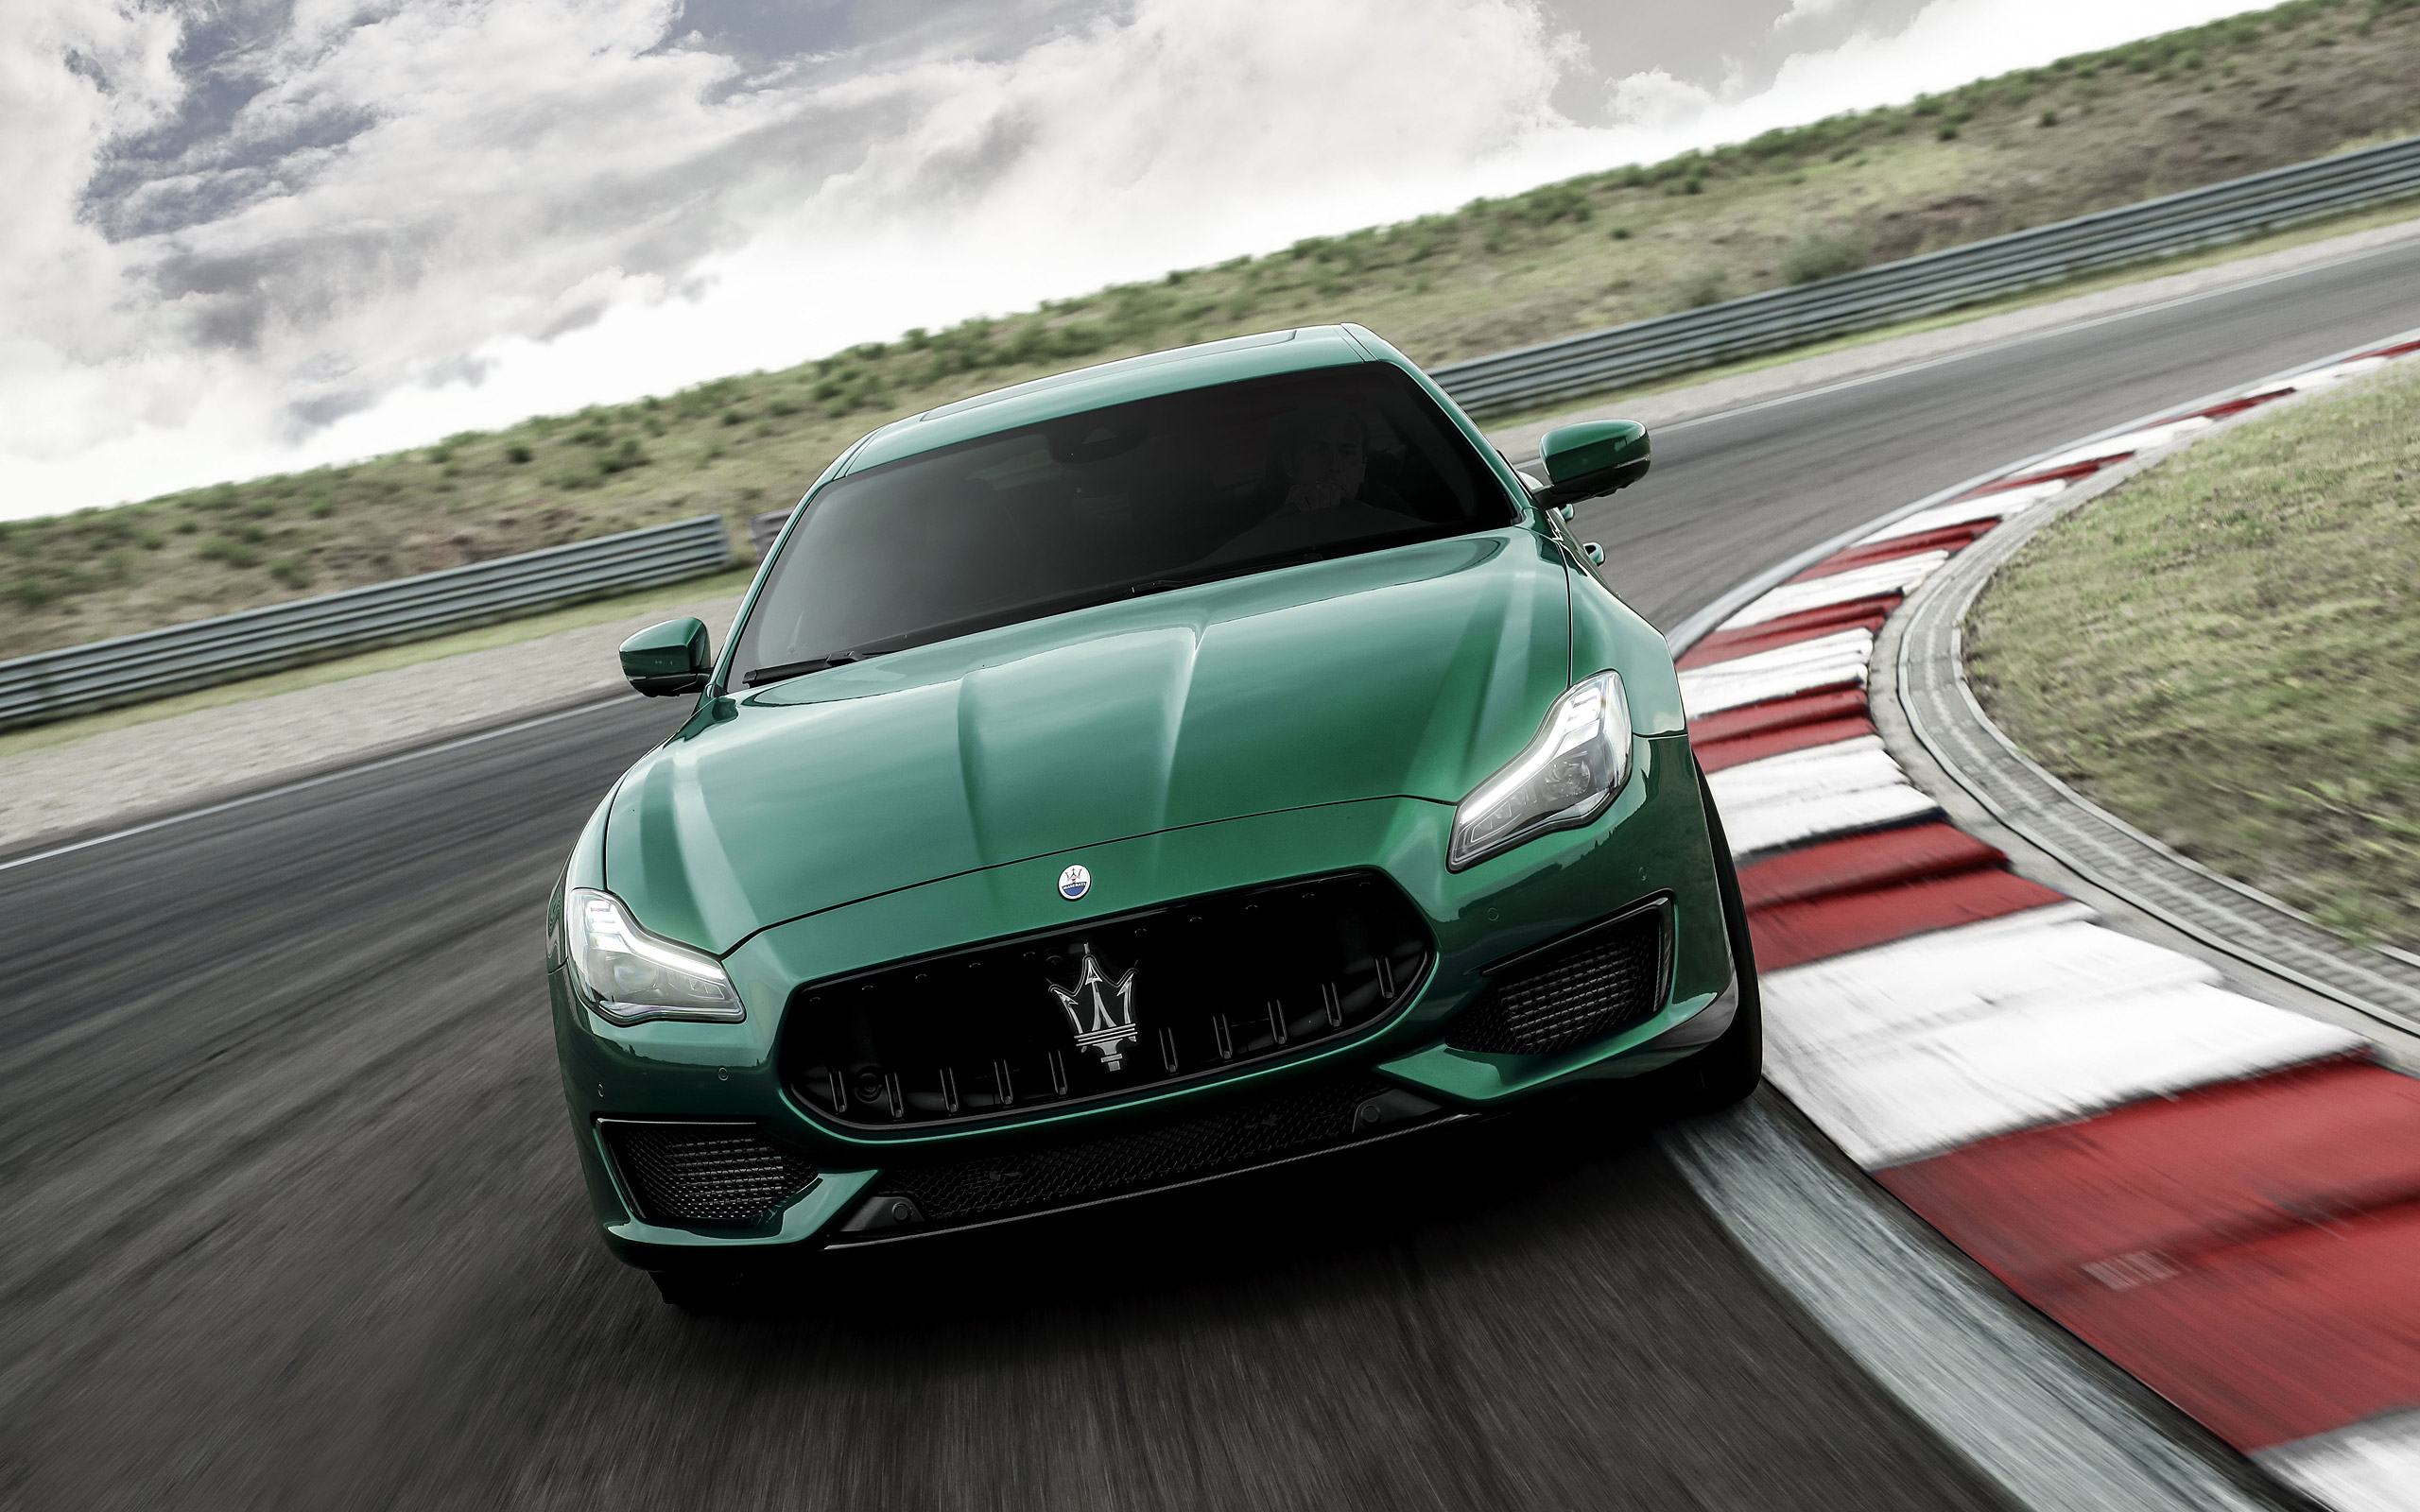 2021 Maserati Quattroporte Models